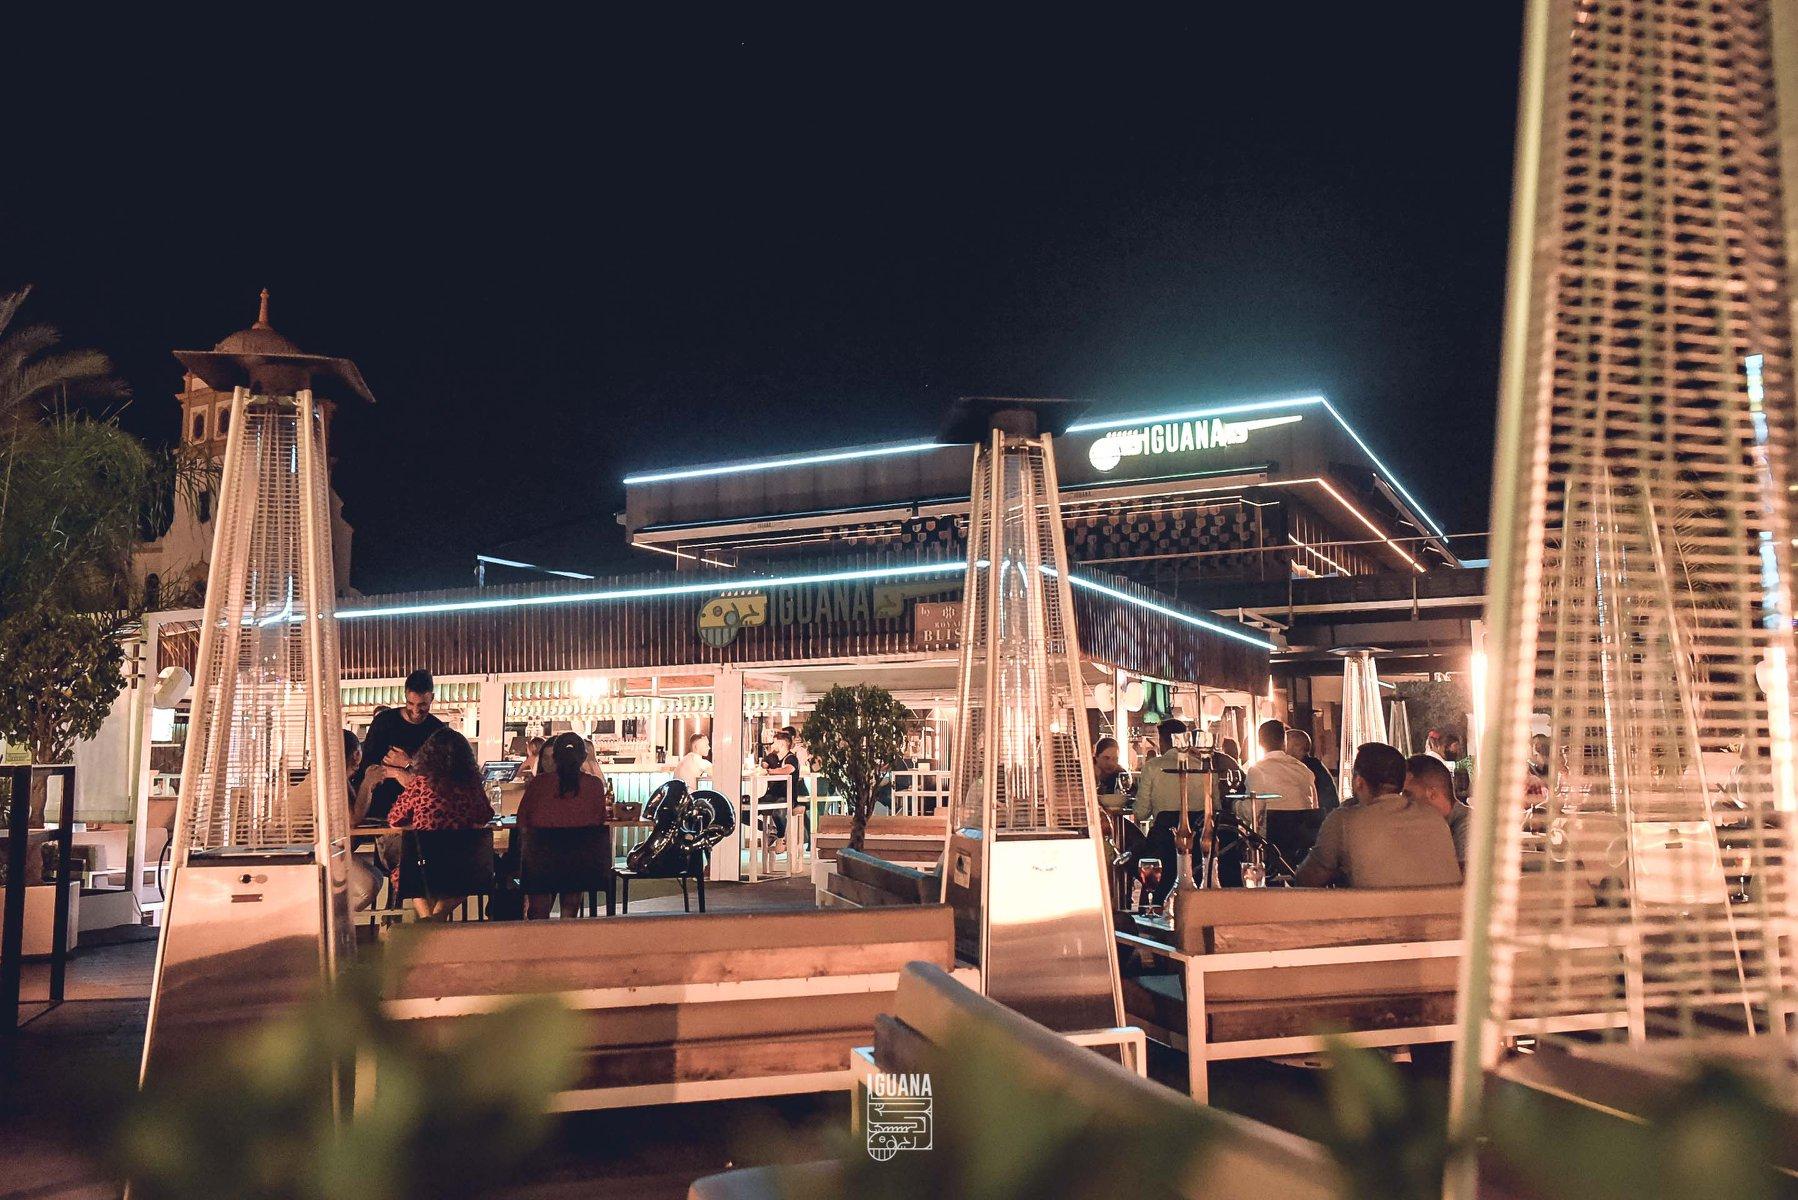 Iguana Snack's Restaurant and Shisha Lounge with Terrace in Sevilla Cachimba Hookah Chicha Kalyan